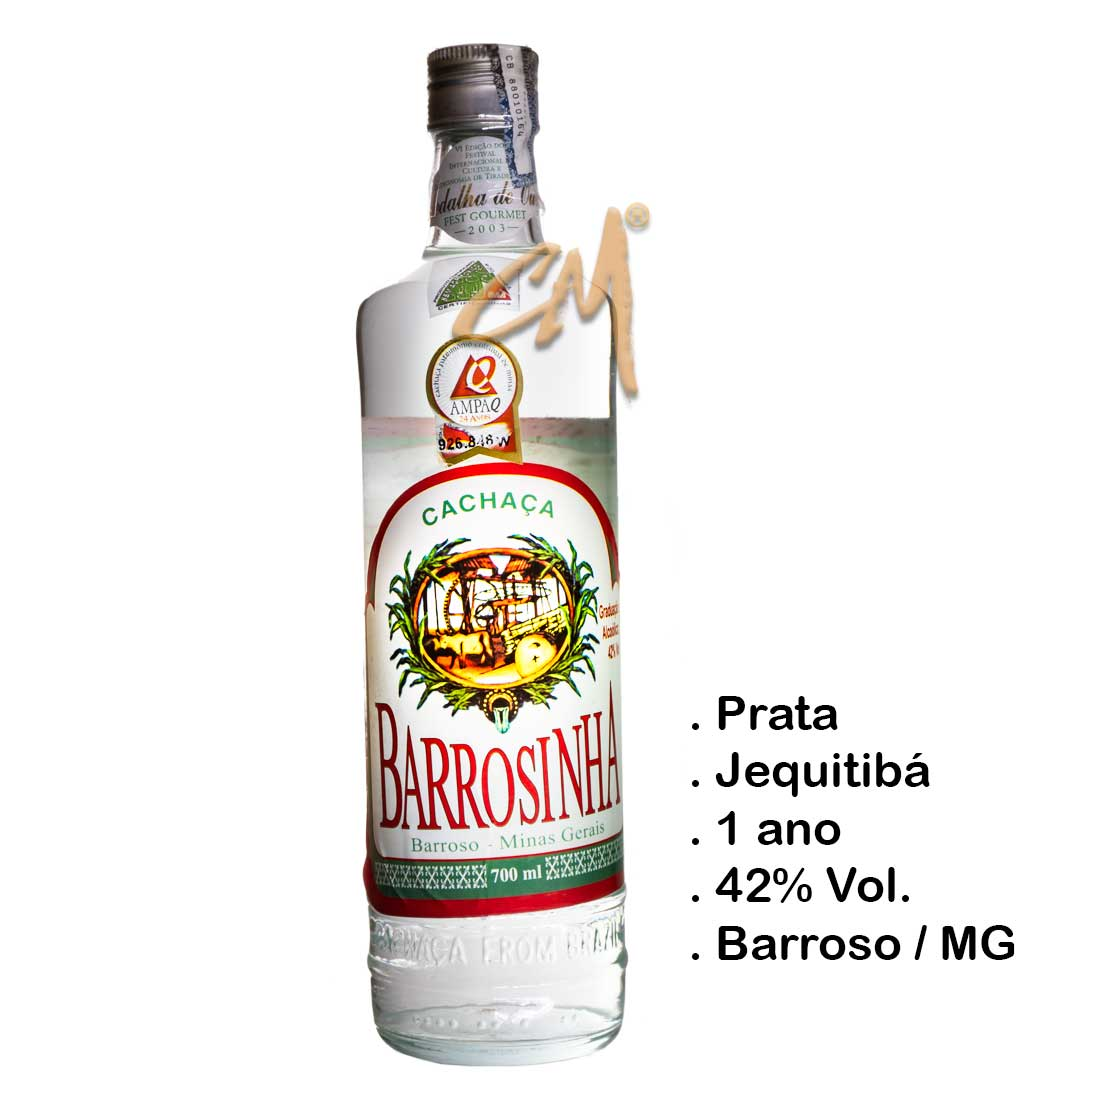 Cachaça Barrosinha Prata 700 ml (Barroso - MG)